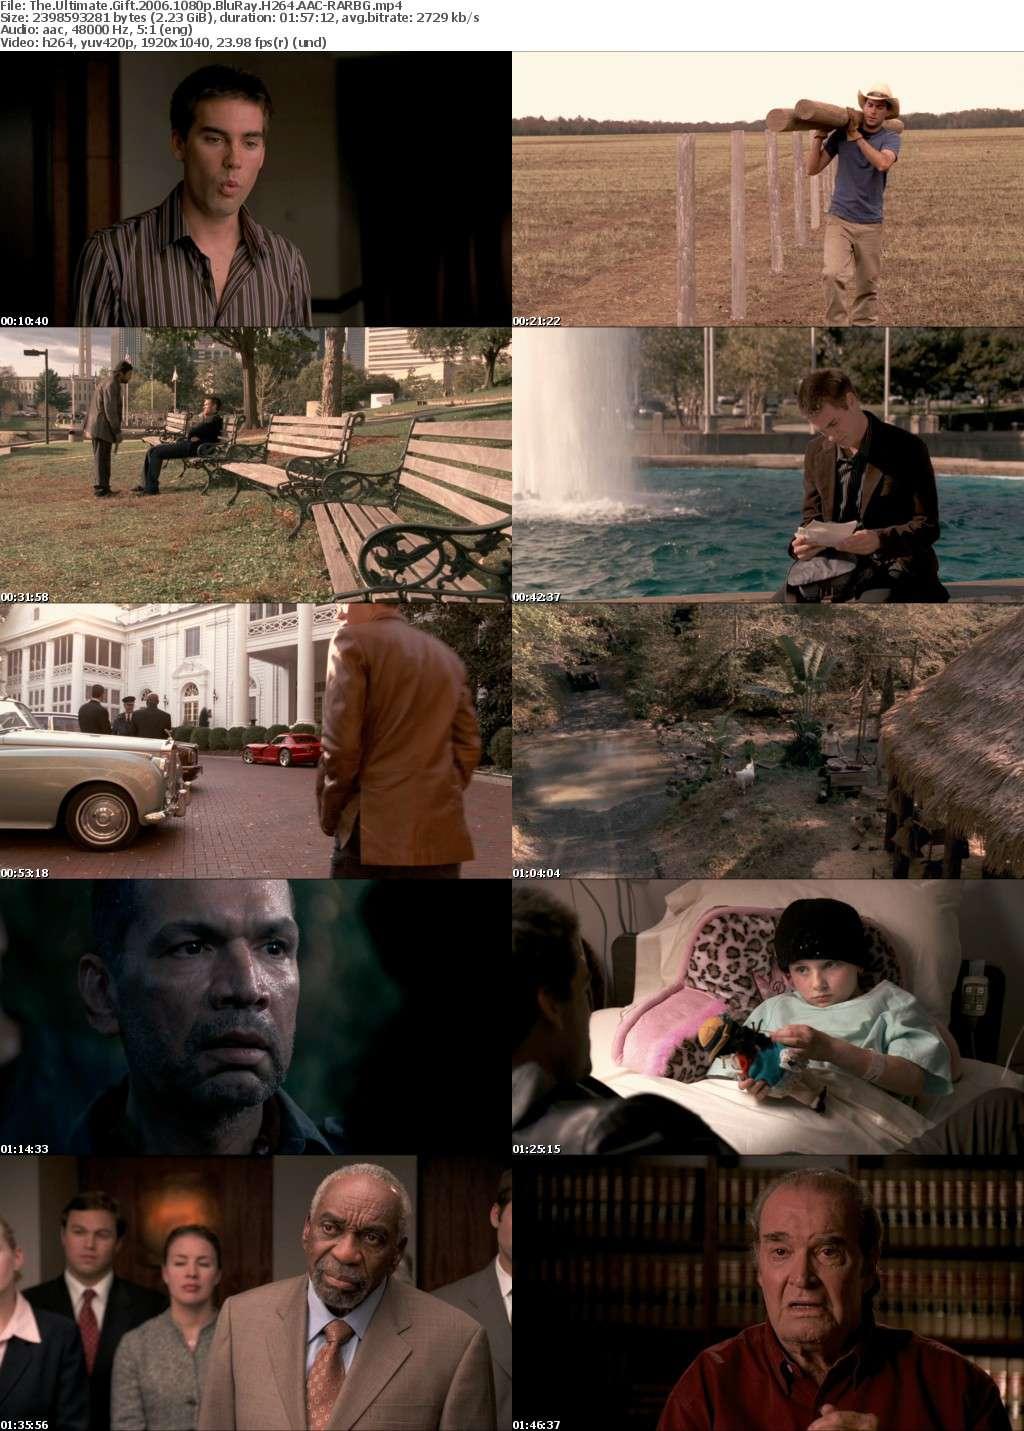 The Ultimate Gift 2006 1080p BluRay H264 AAC-RARBG